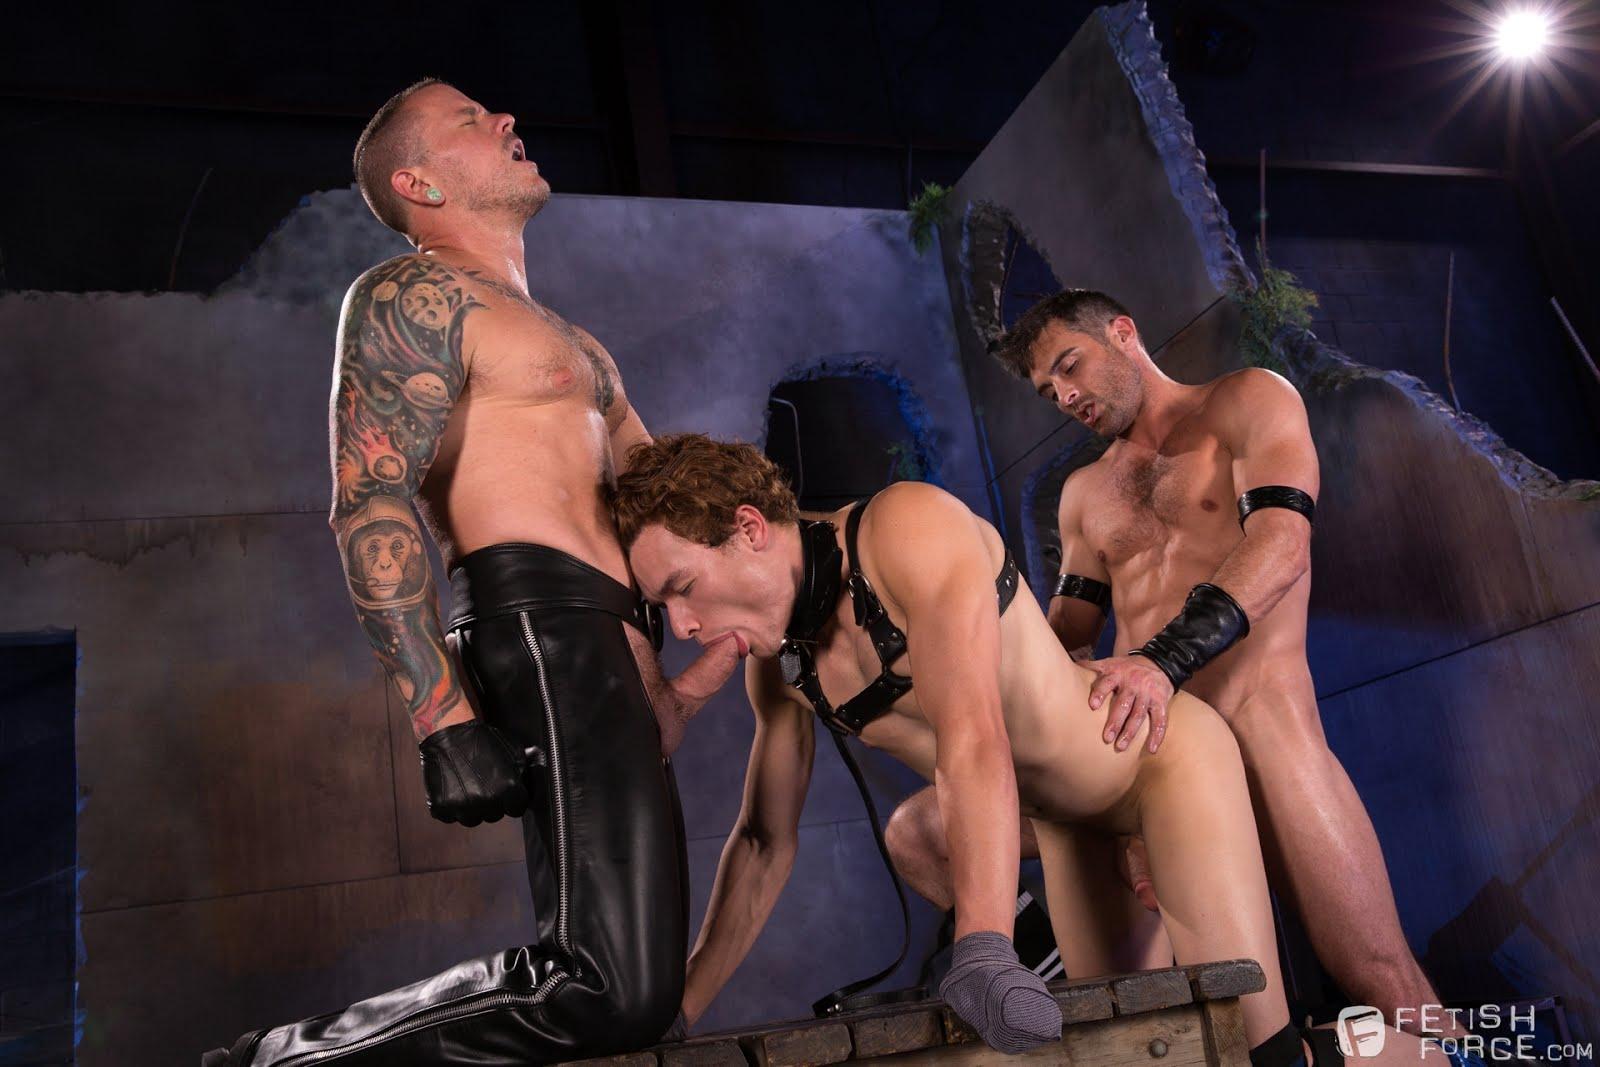 gay huge cocks wanking